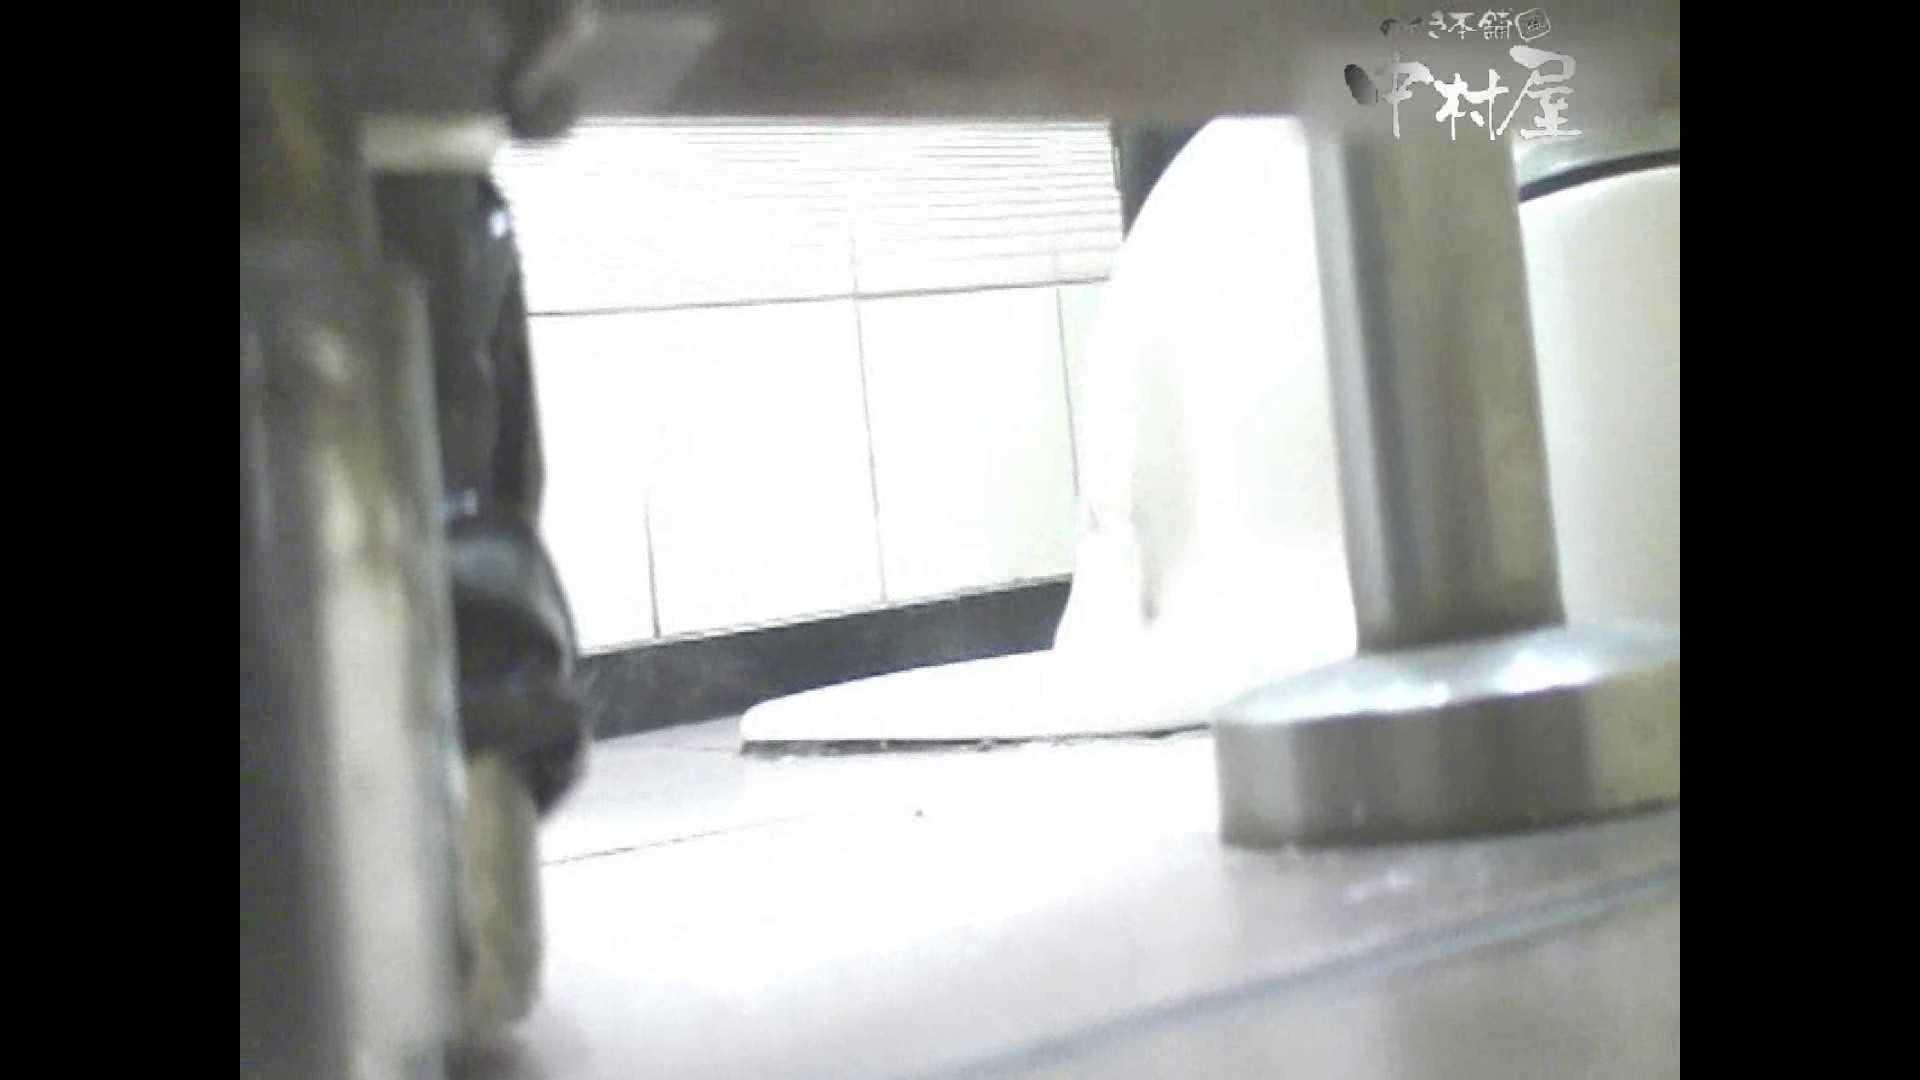 岩手県在住盗撮師盗撮記録vol.38 盗撮 AV動画キャプチャ 84枚 68